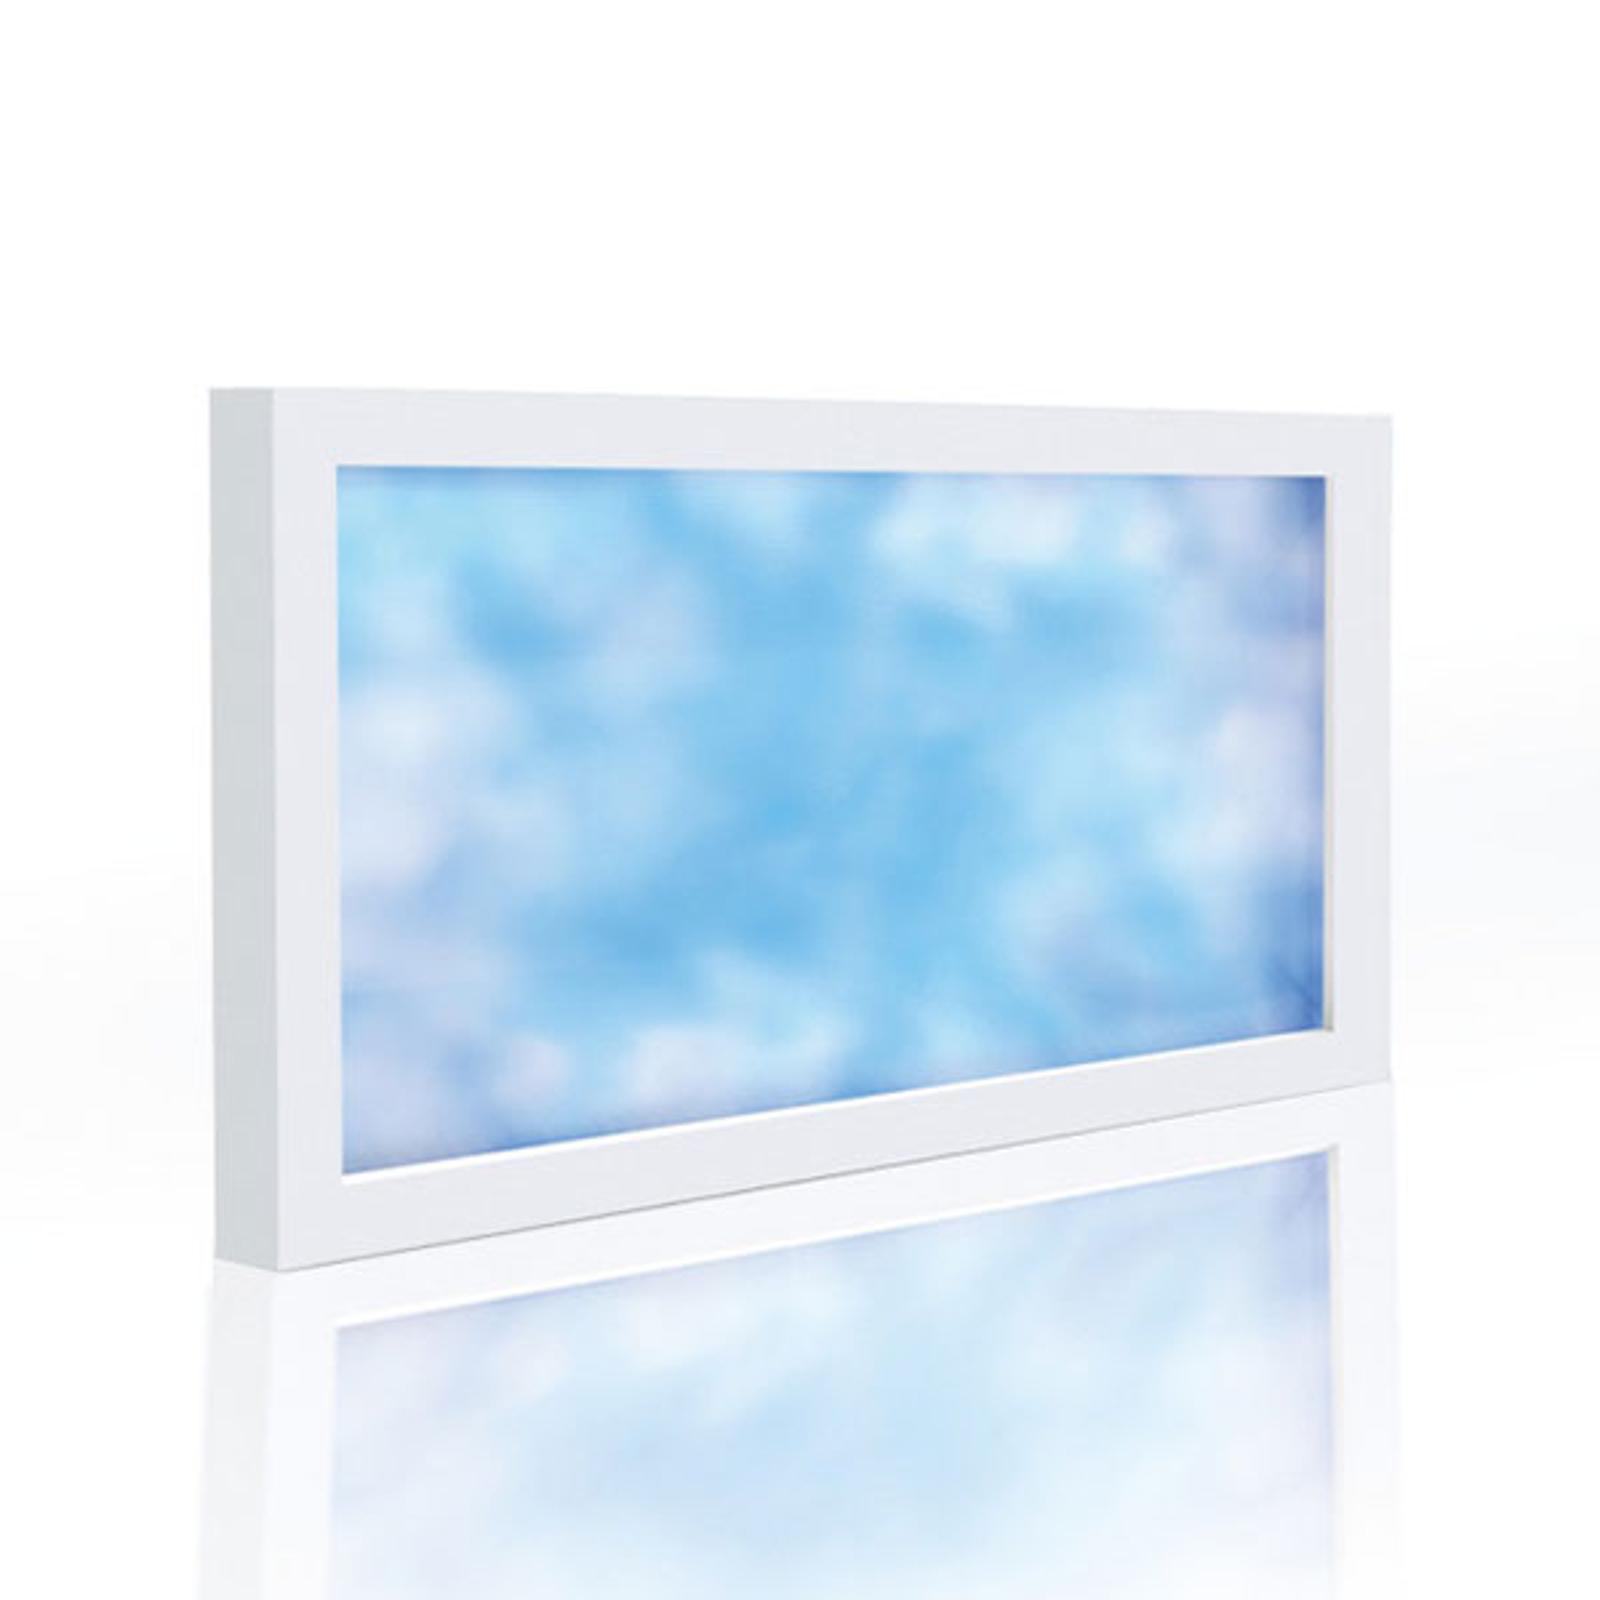 LED-panel Sky Window 120 x 60 cm